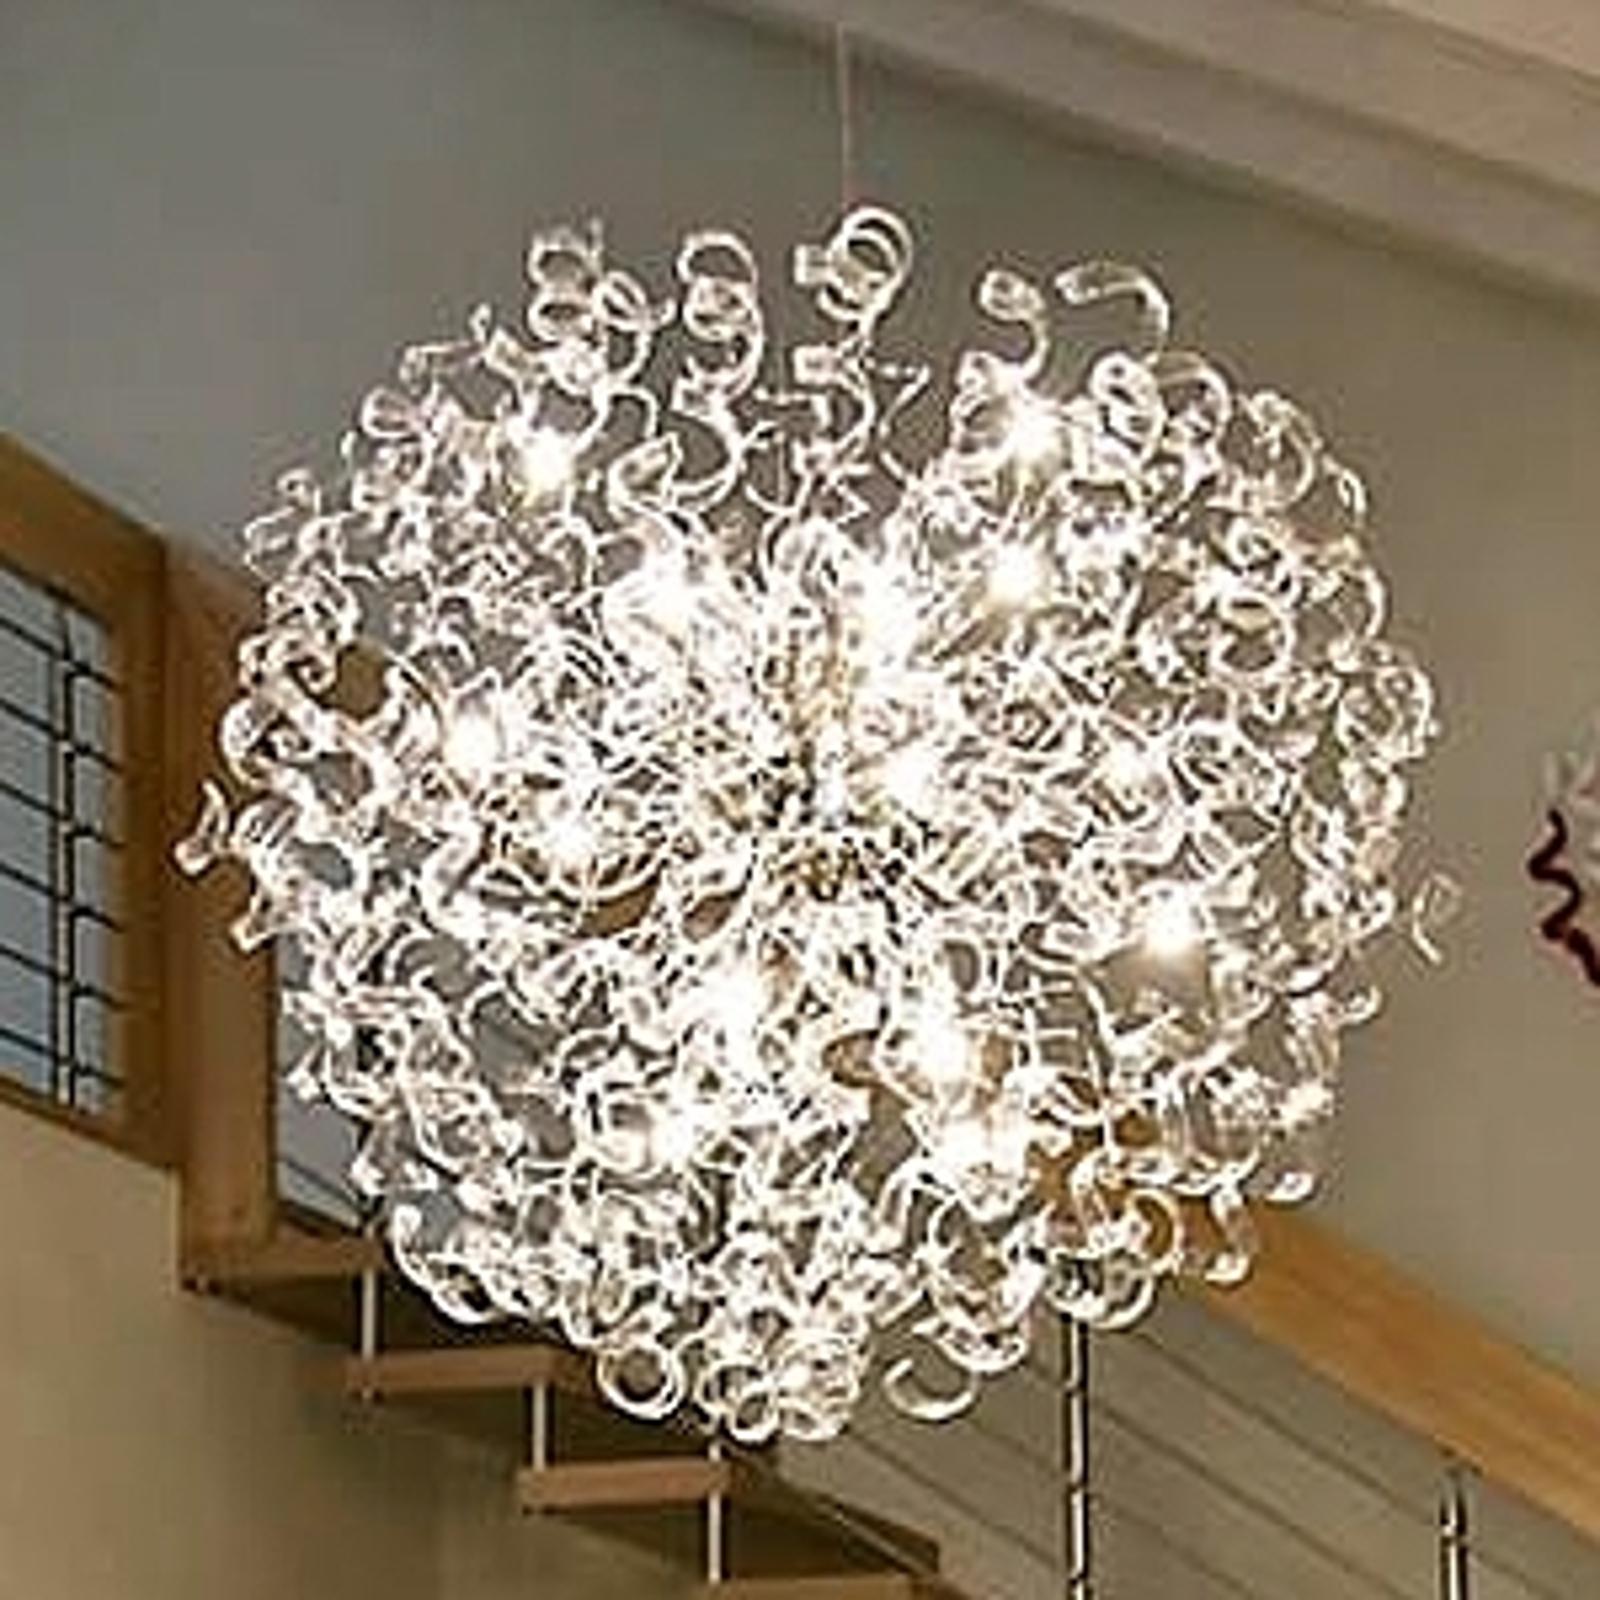 Innovatieve hanglamp Crystal Kugel, 115 cm